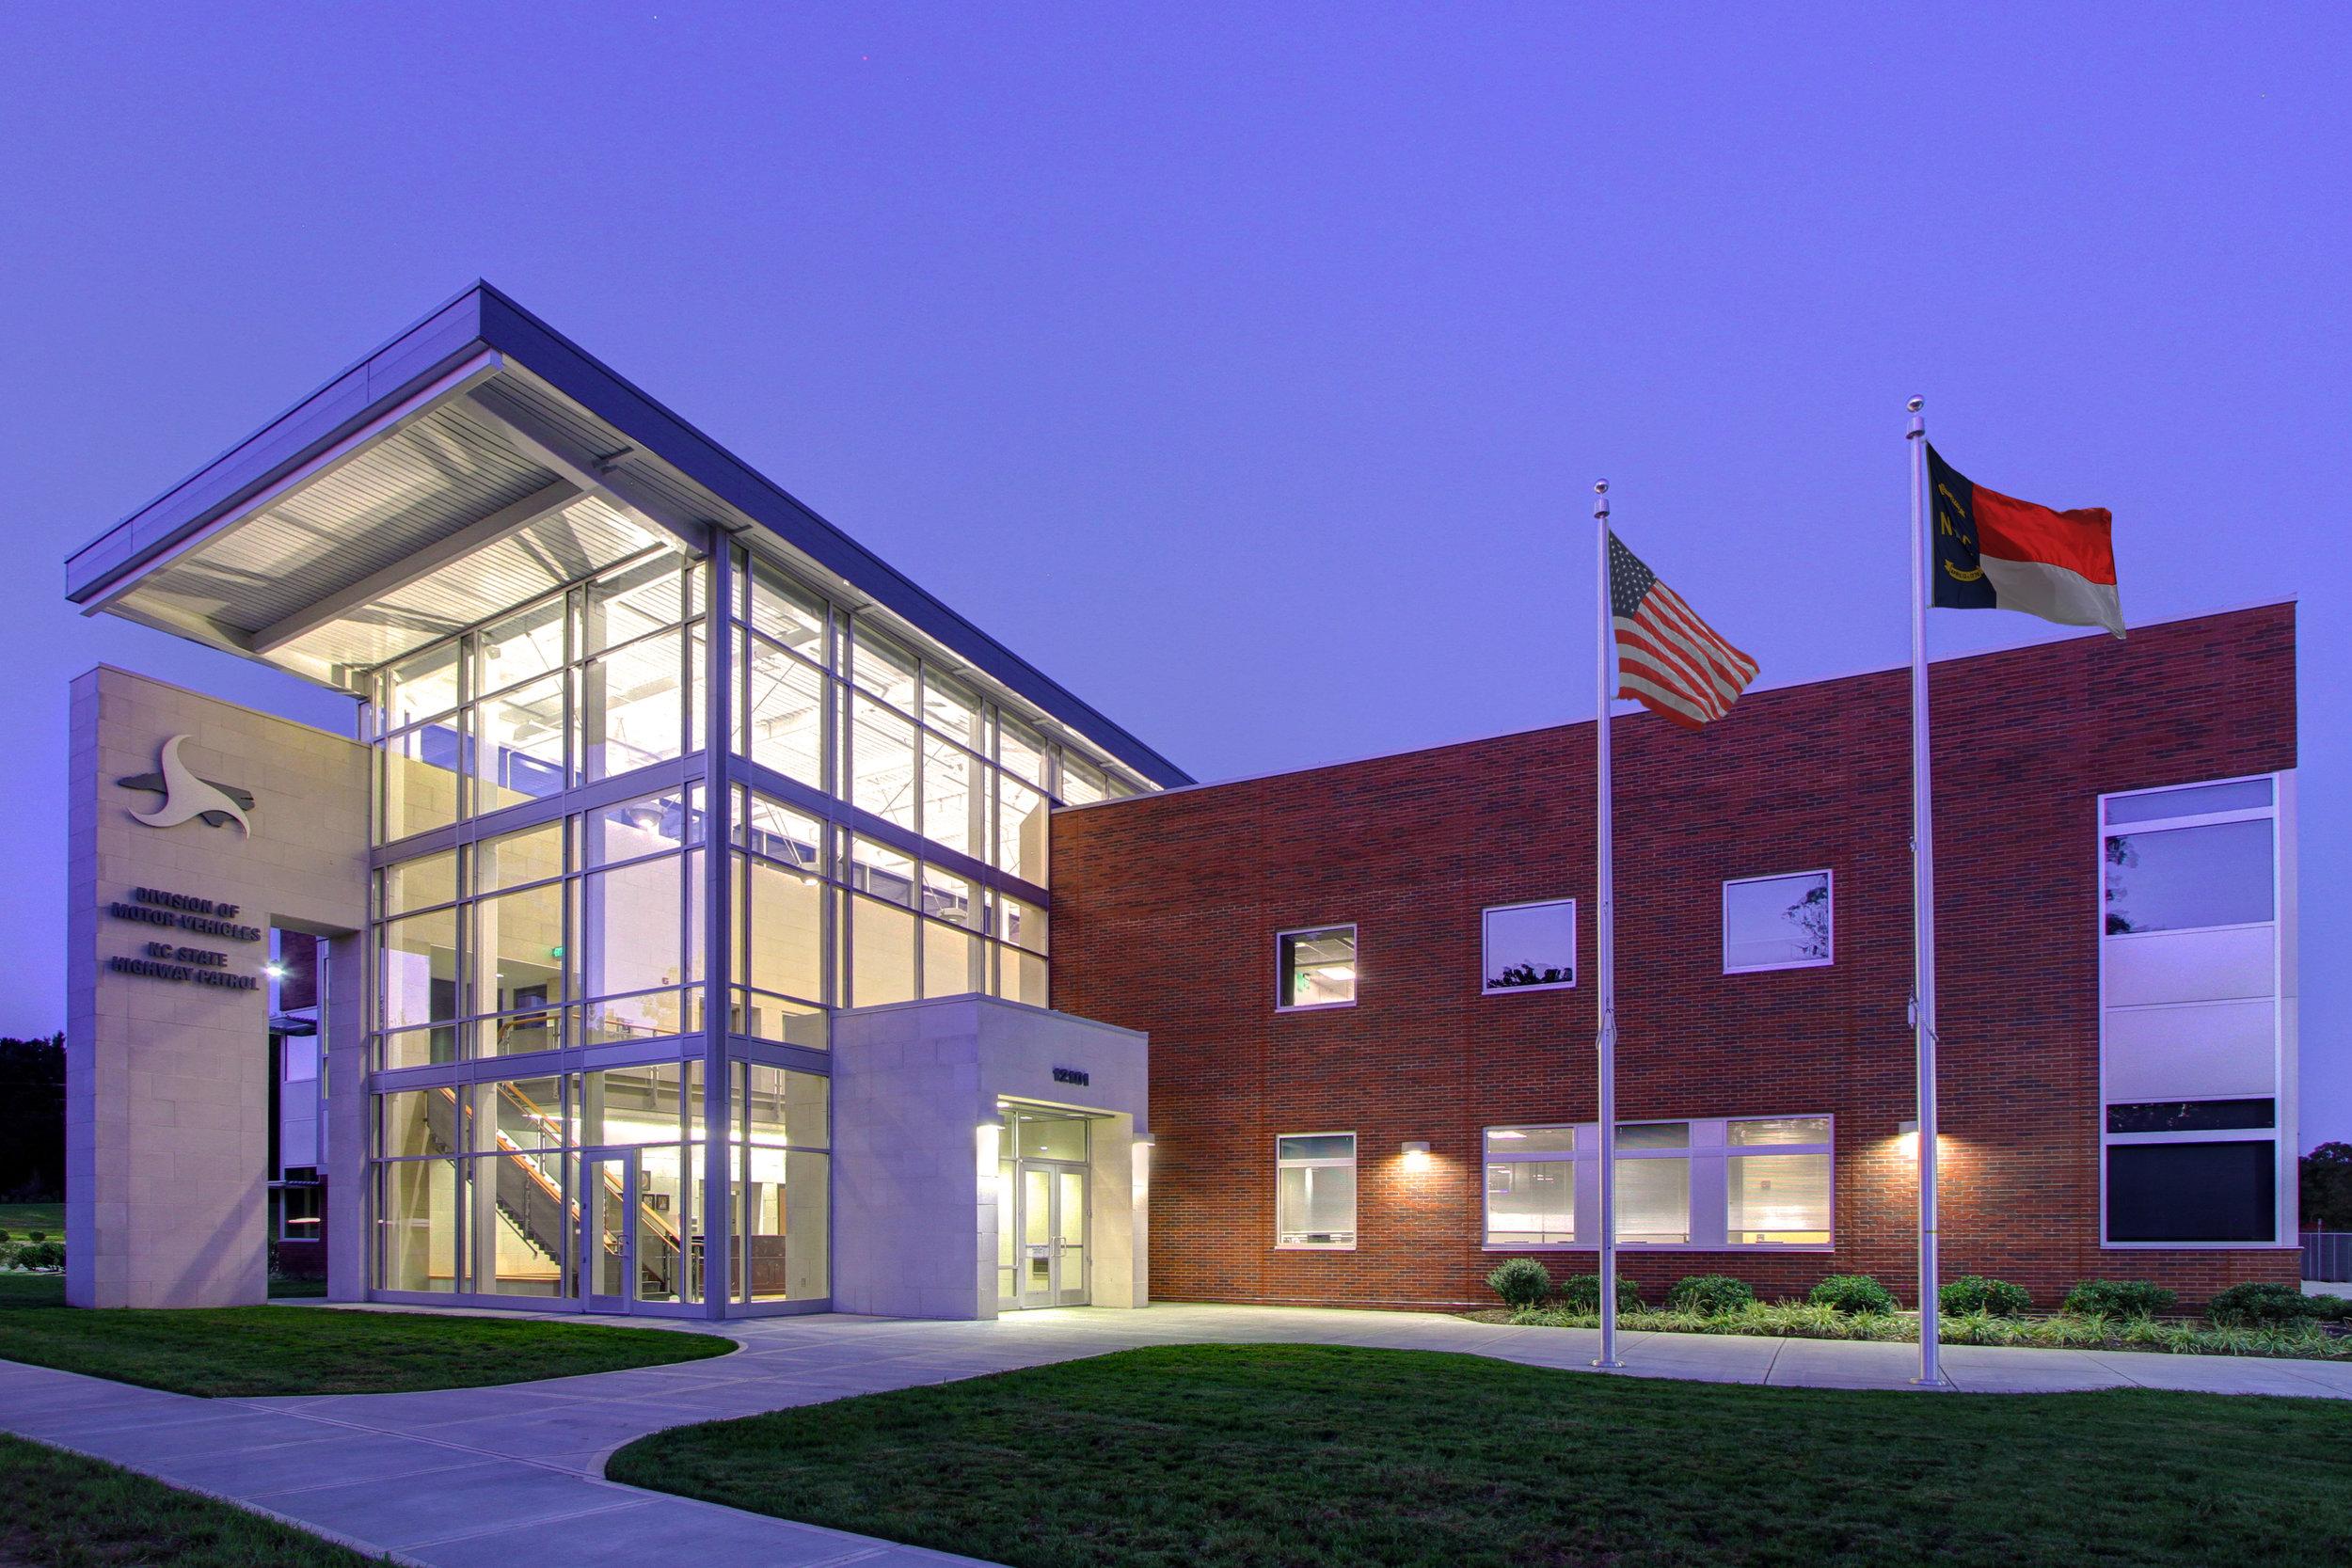 ADW-Public-Safety-Office-NC-DOT-DMV-SHP-Huntersville-NC-Exterior.JPG